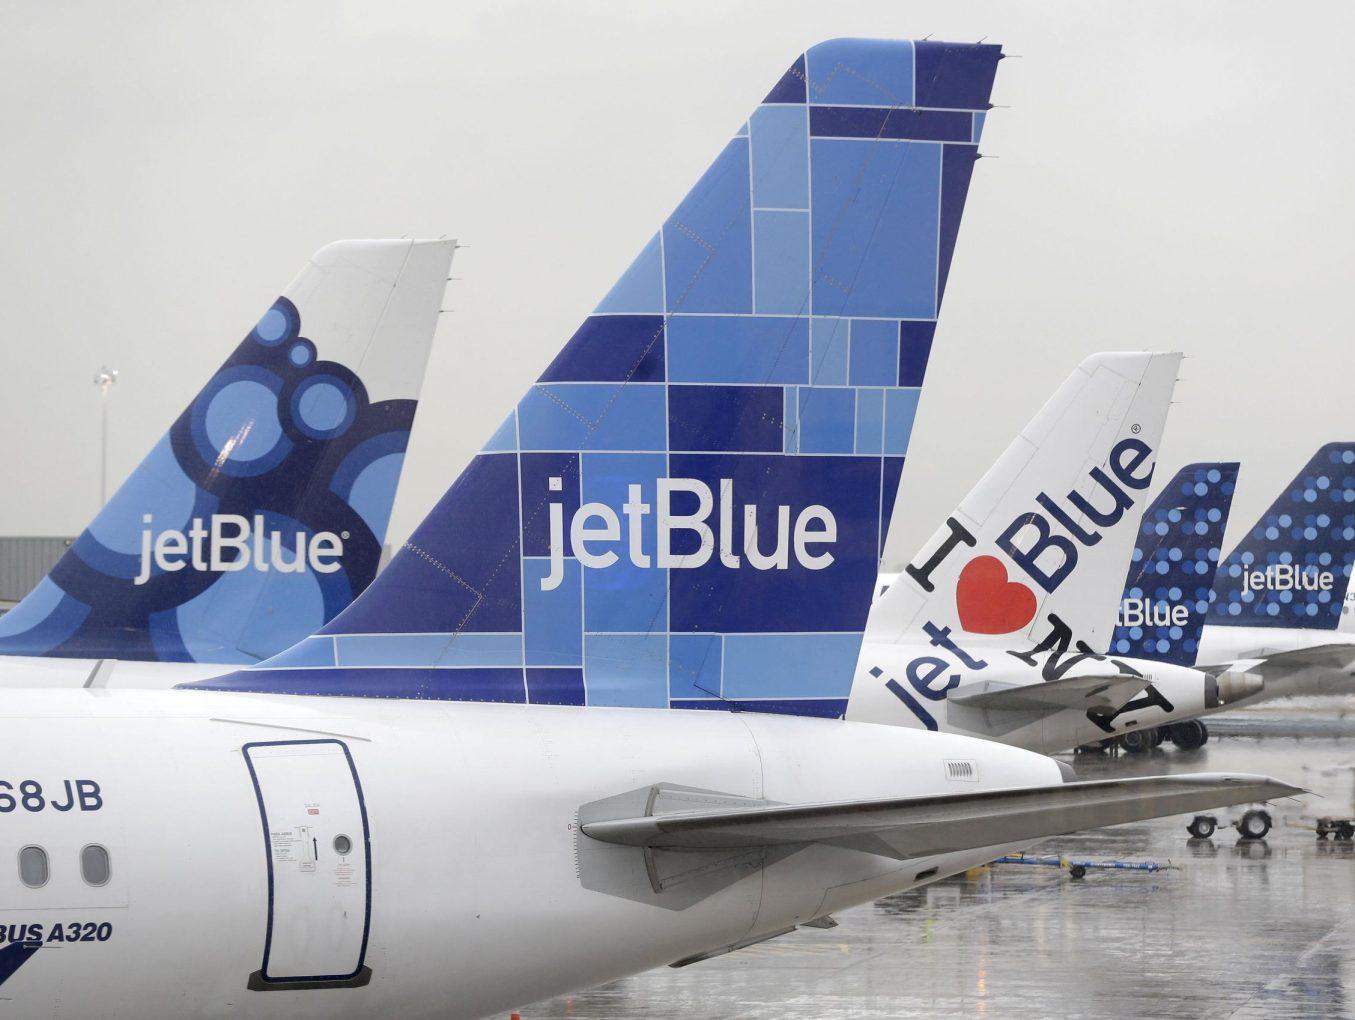 JetBlue Mileage Run - How I Made My Decision